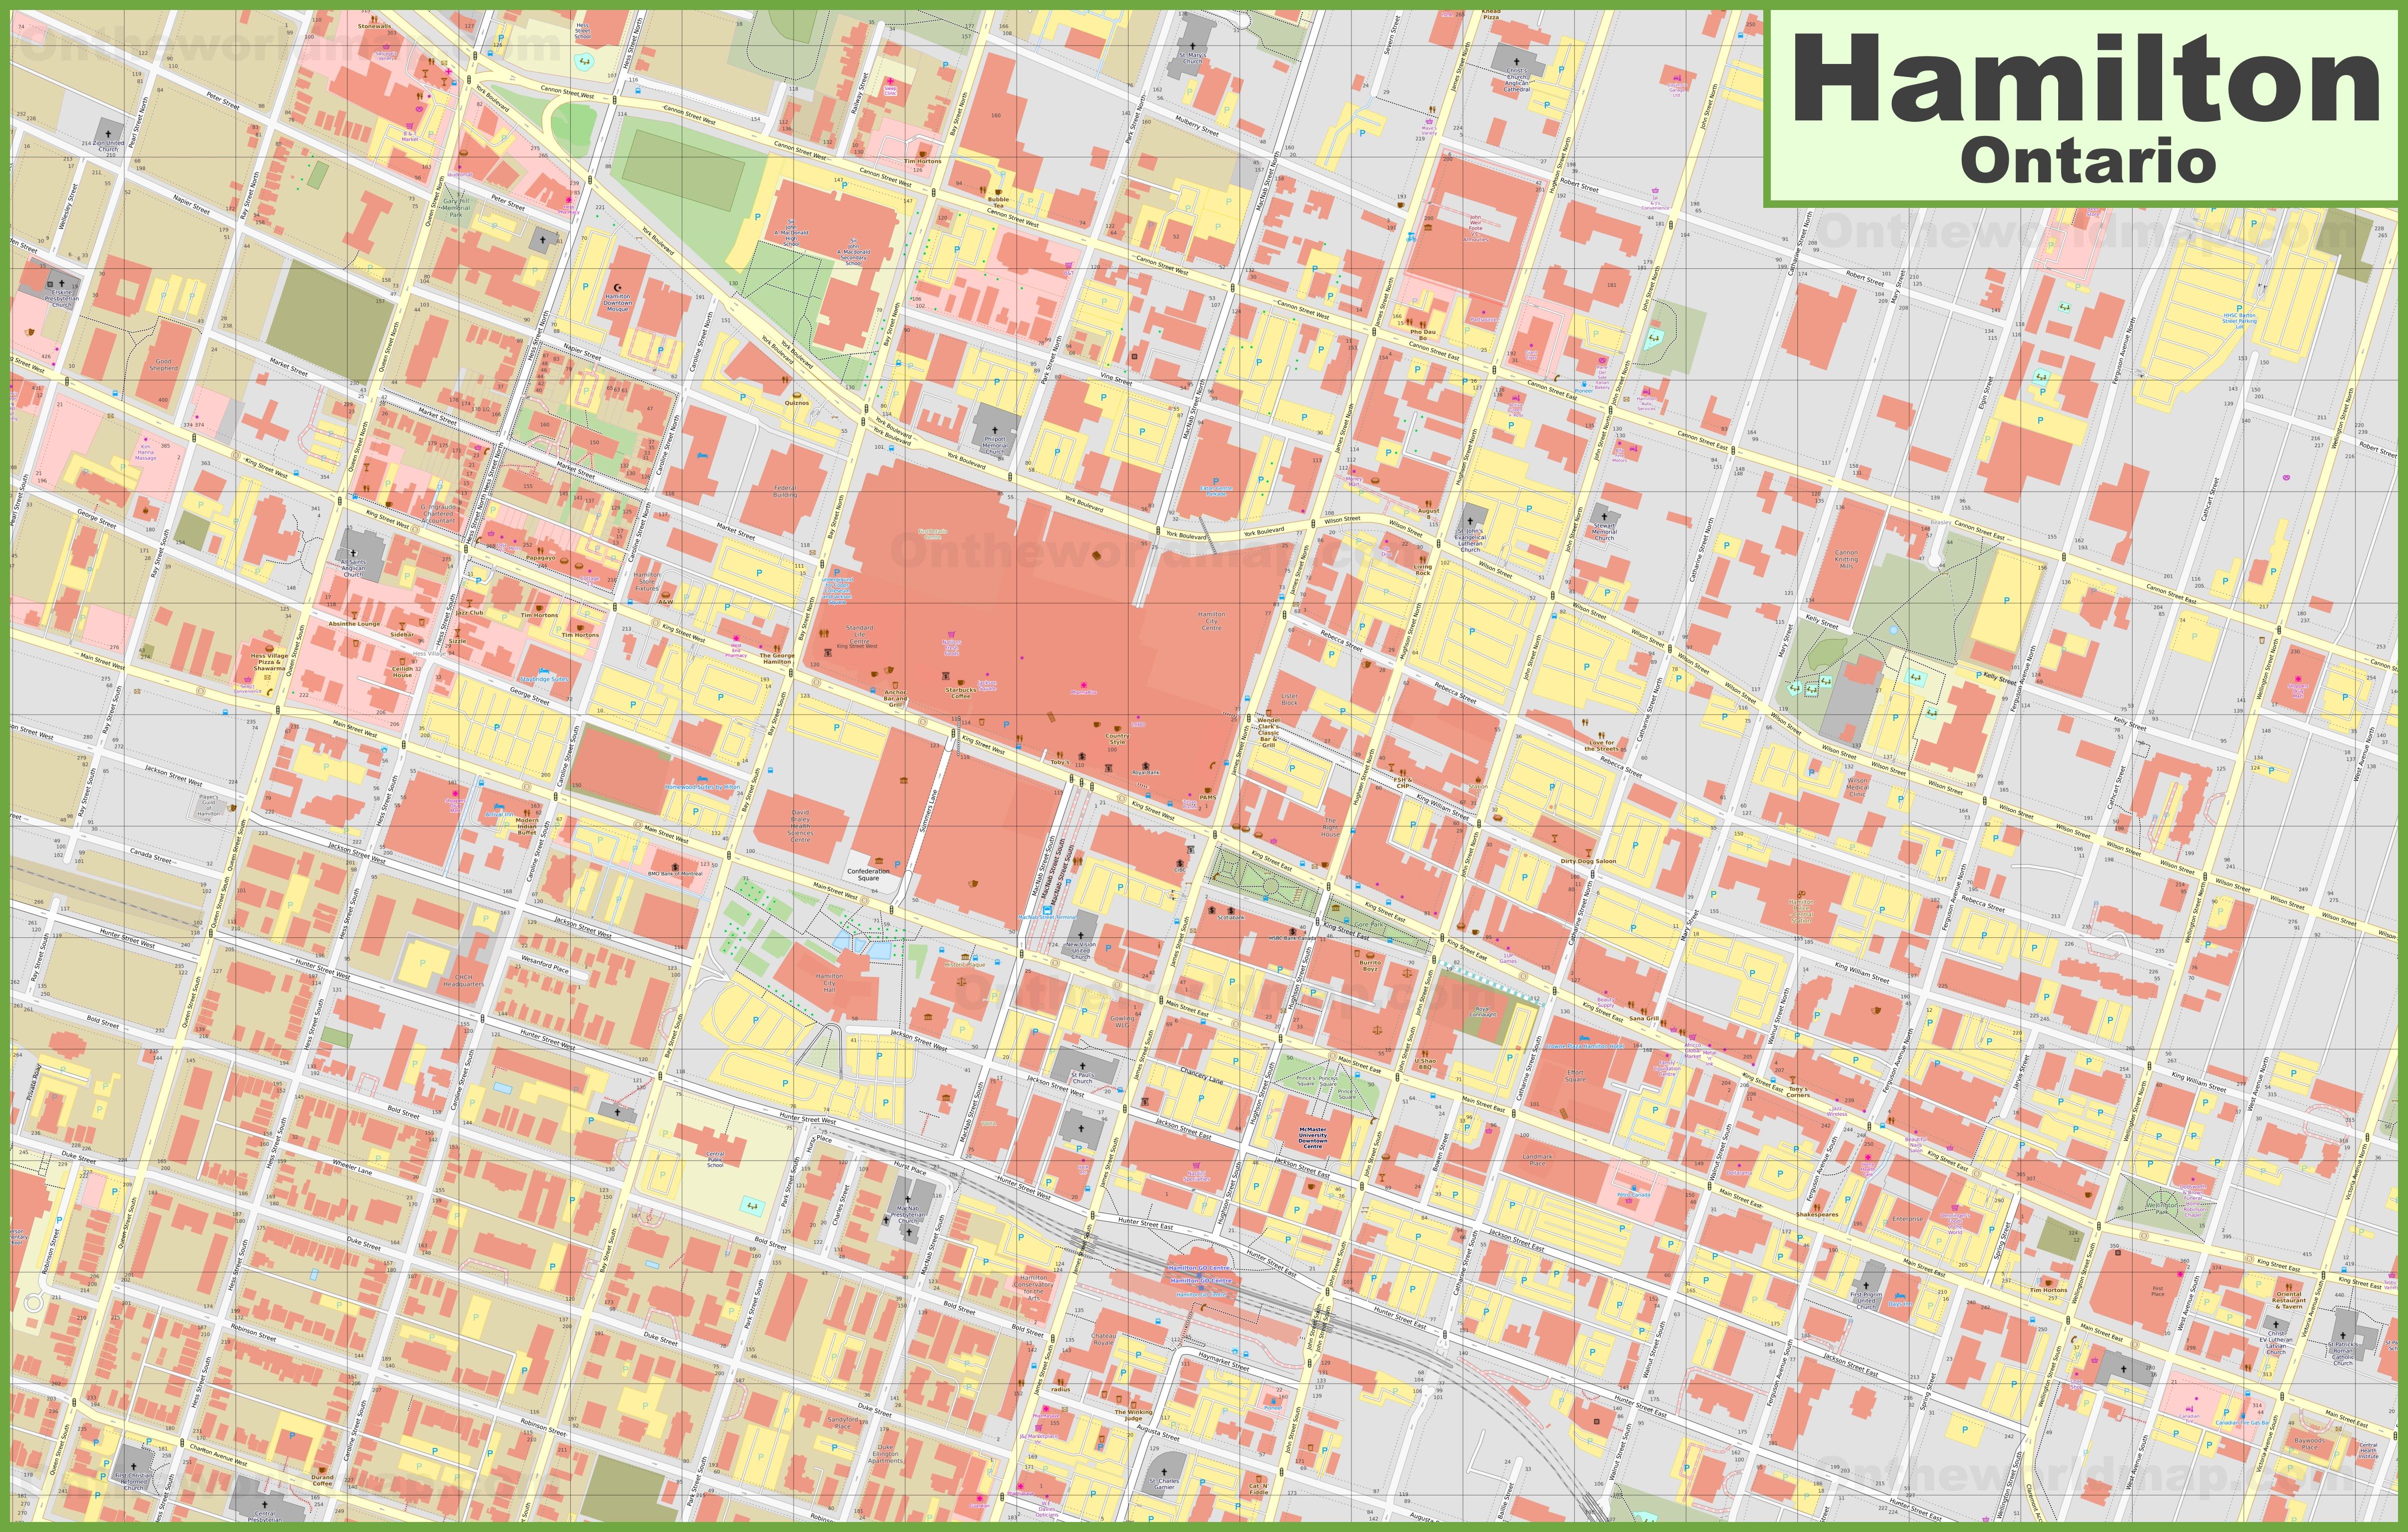 Hamilton downtown map